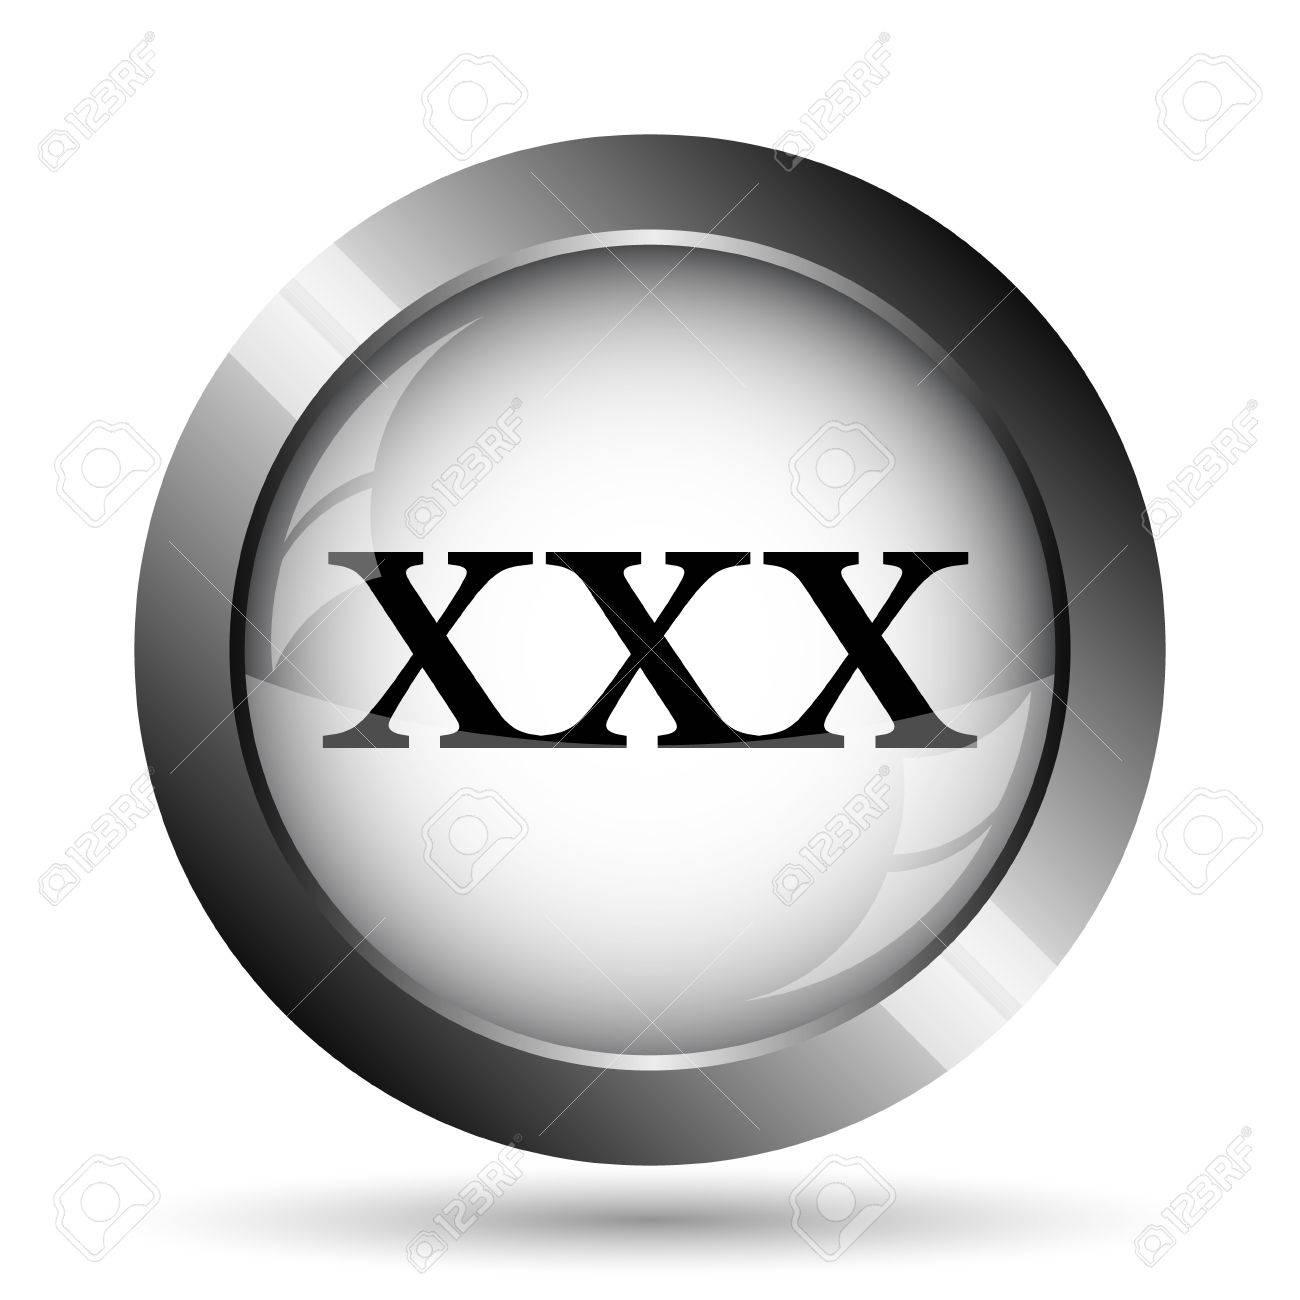 Xxx website